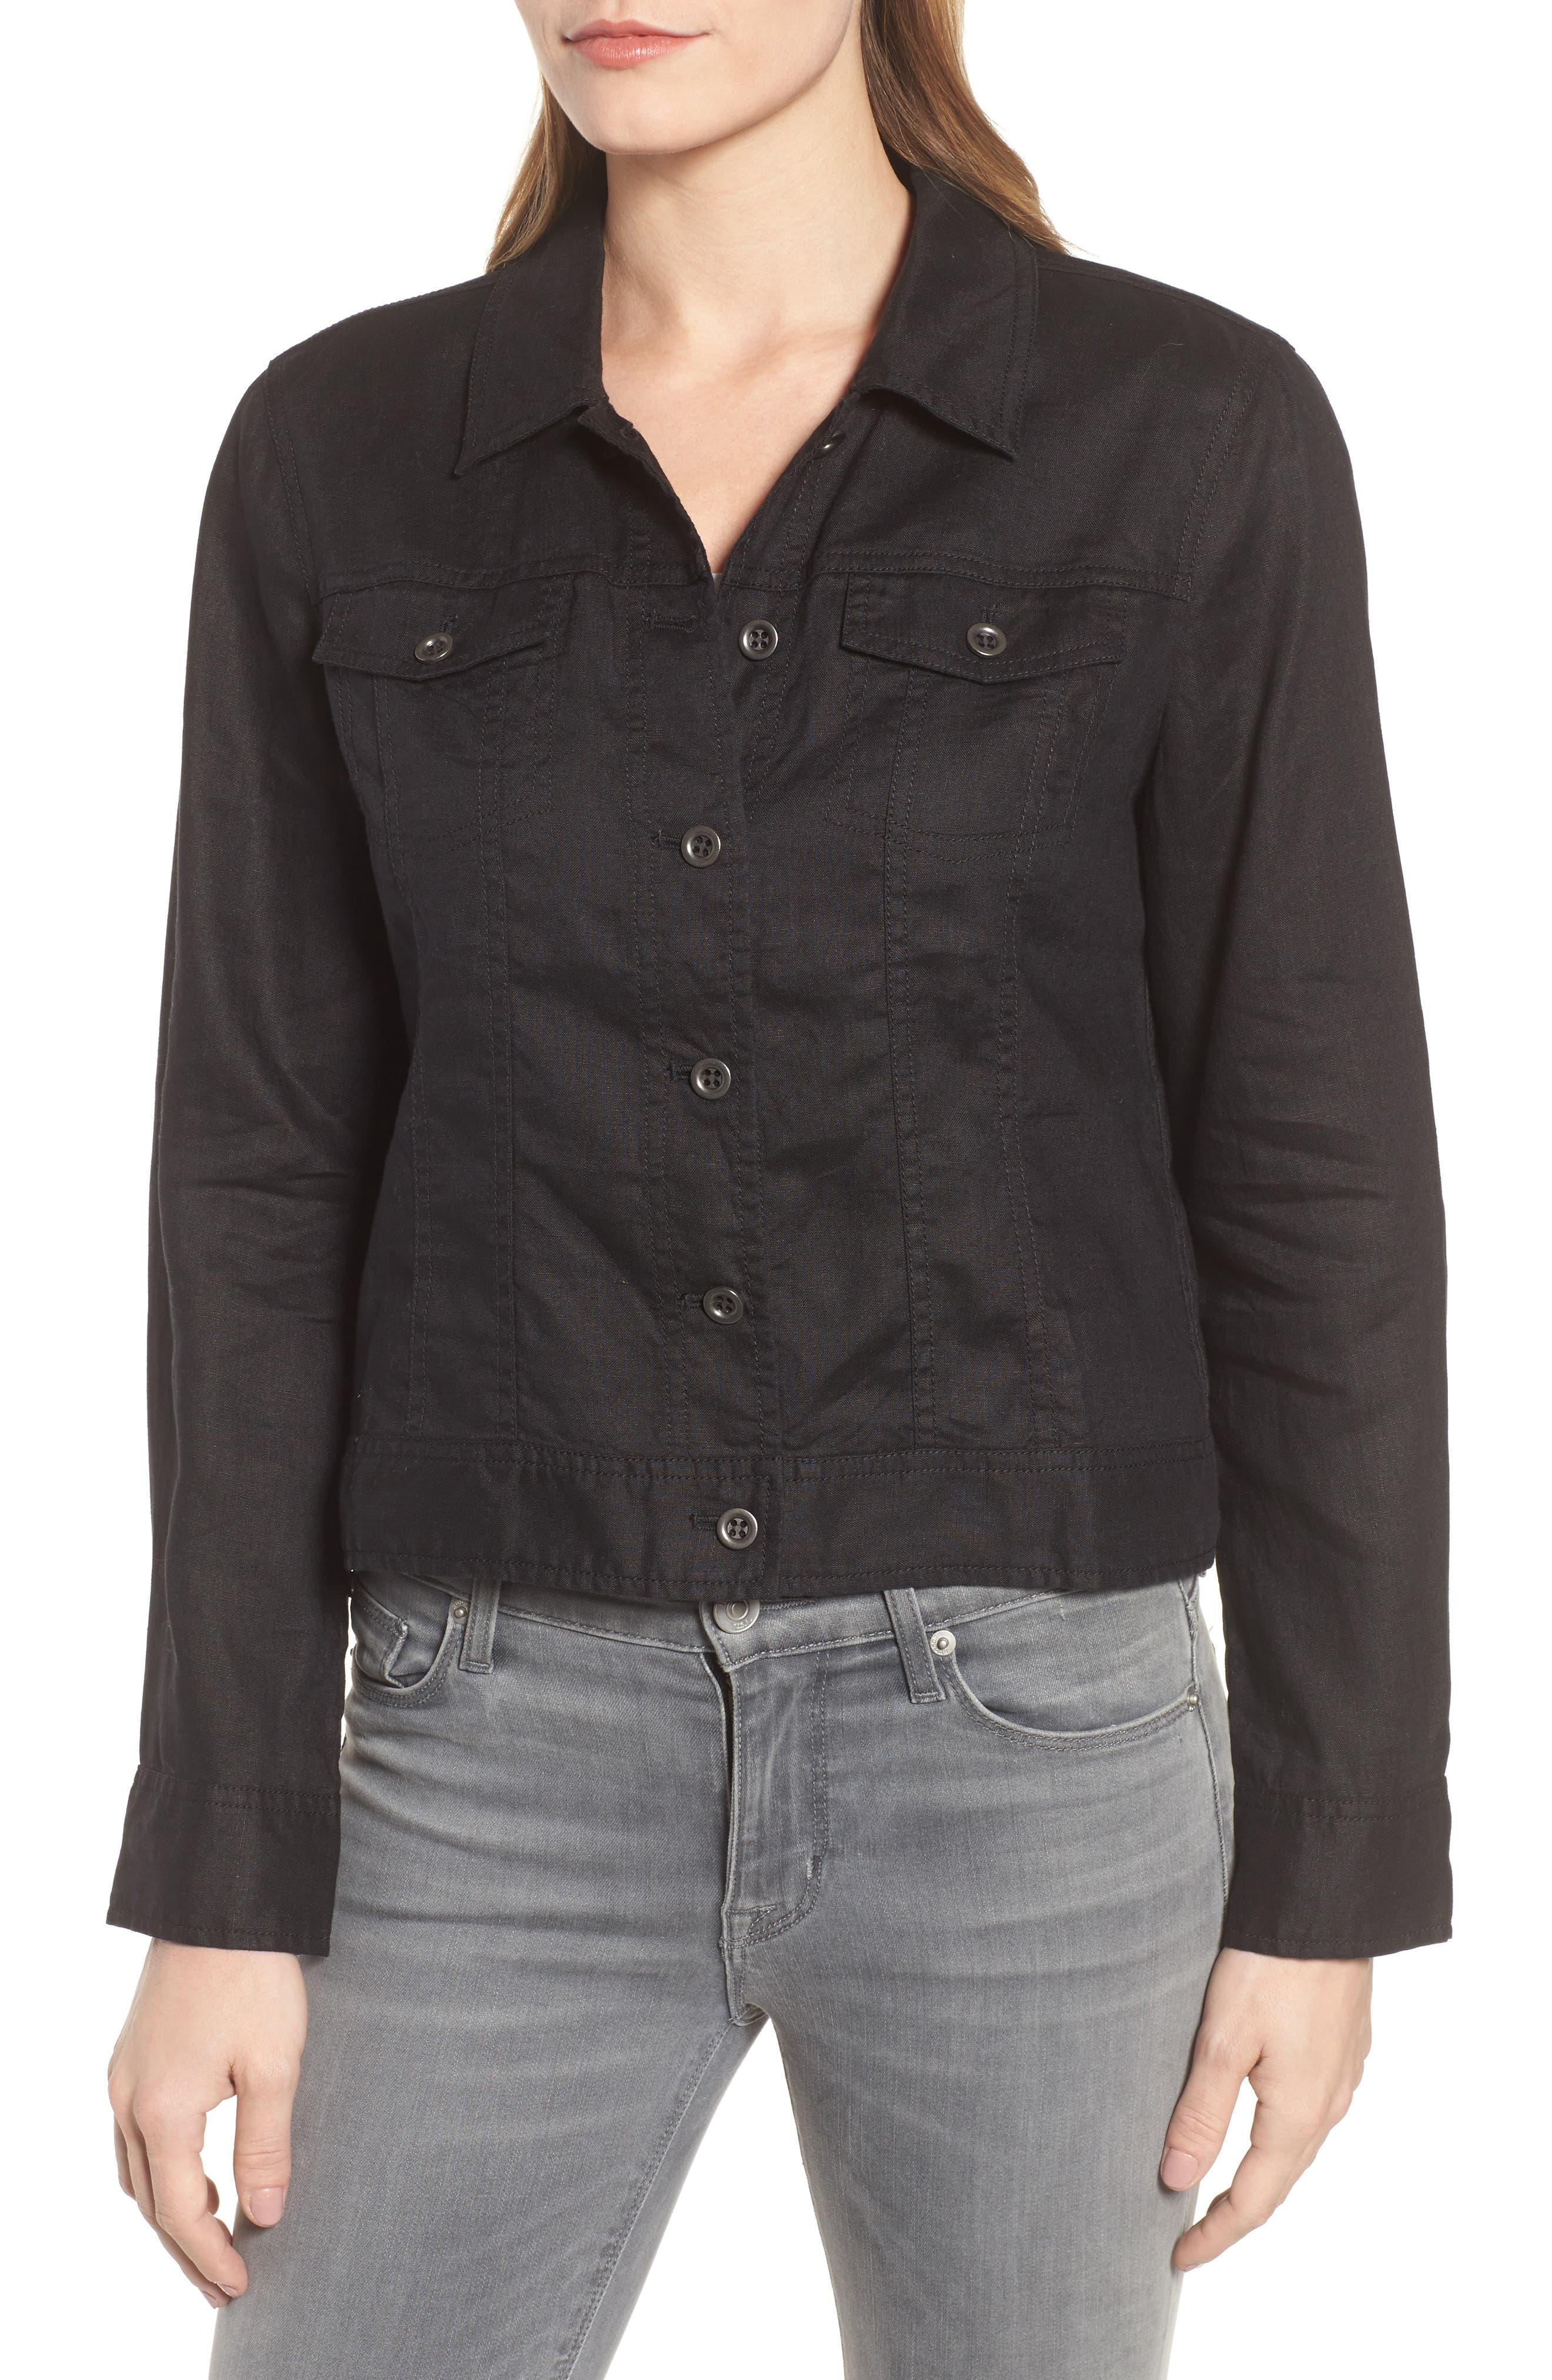 Crop Organic Linen Jacket,                             Alternate thumbnail 4, color,                             Black